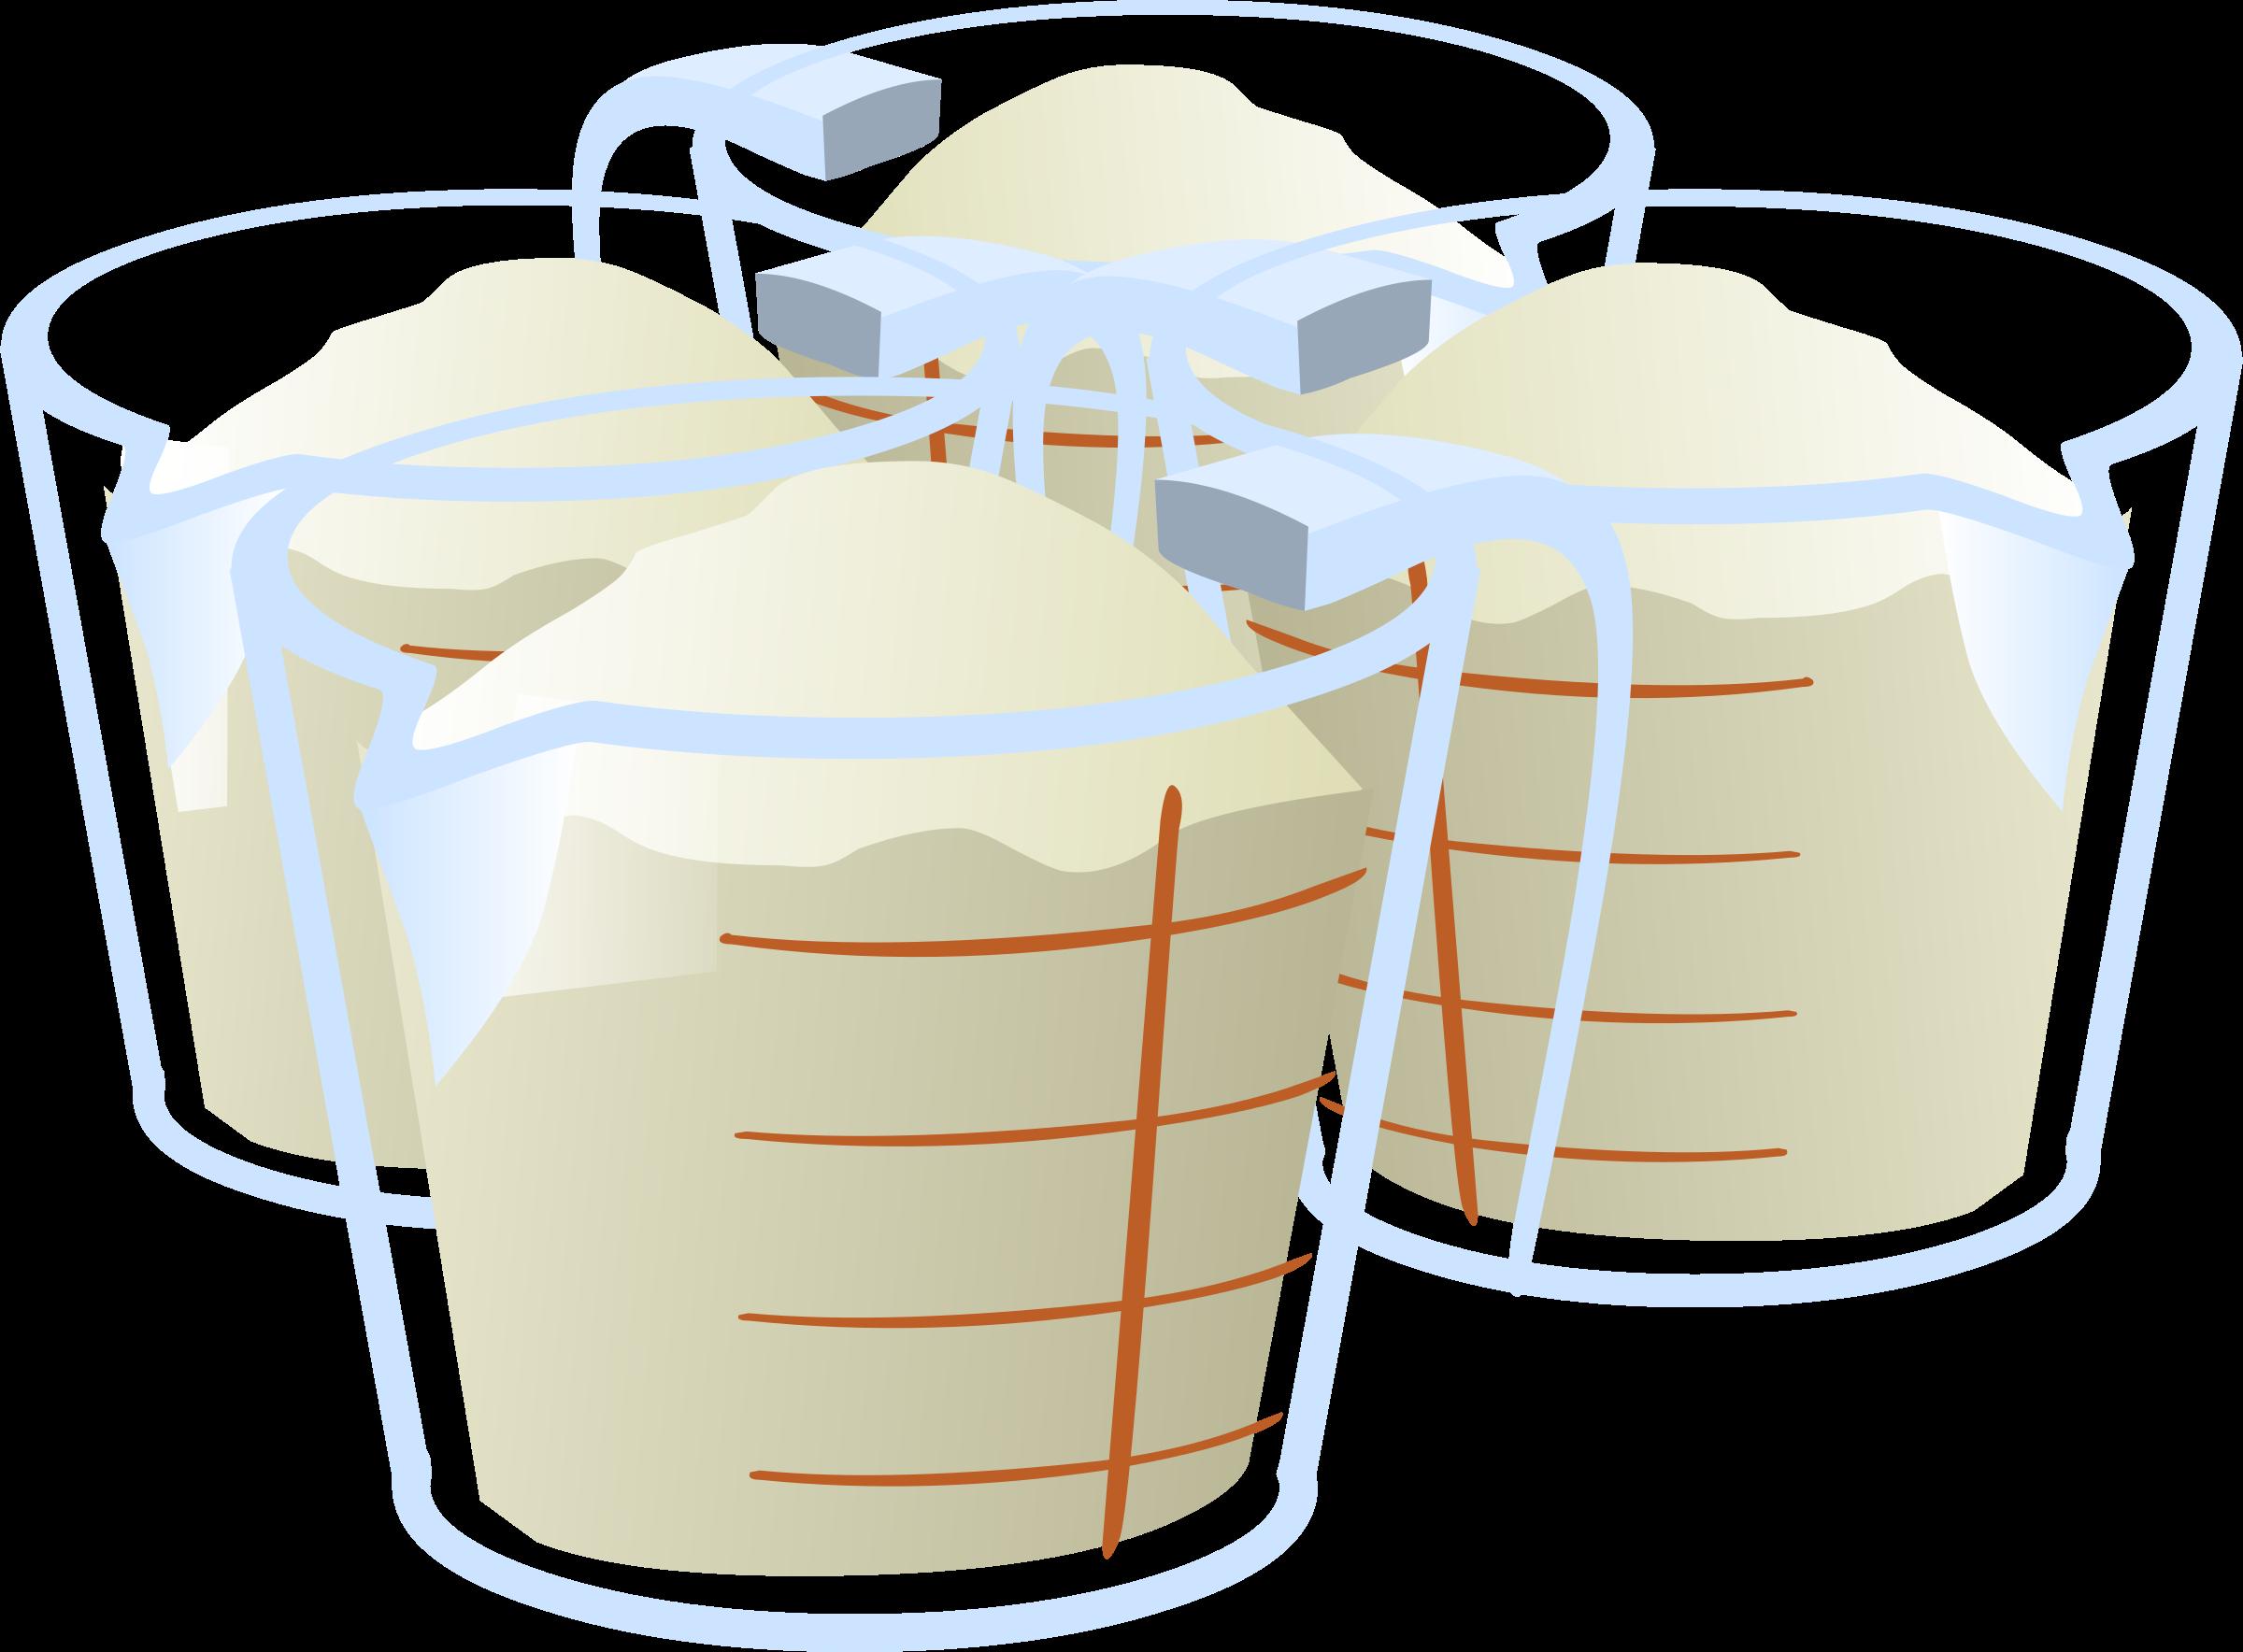 image download Flour clipart. Food big image png.